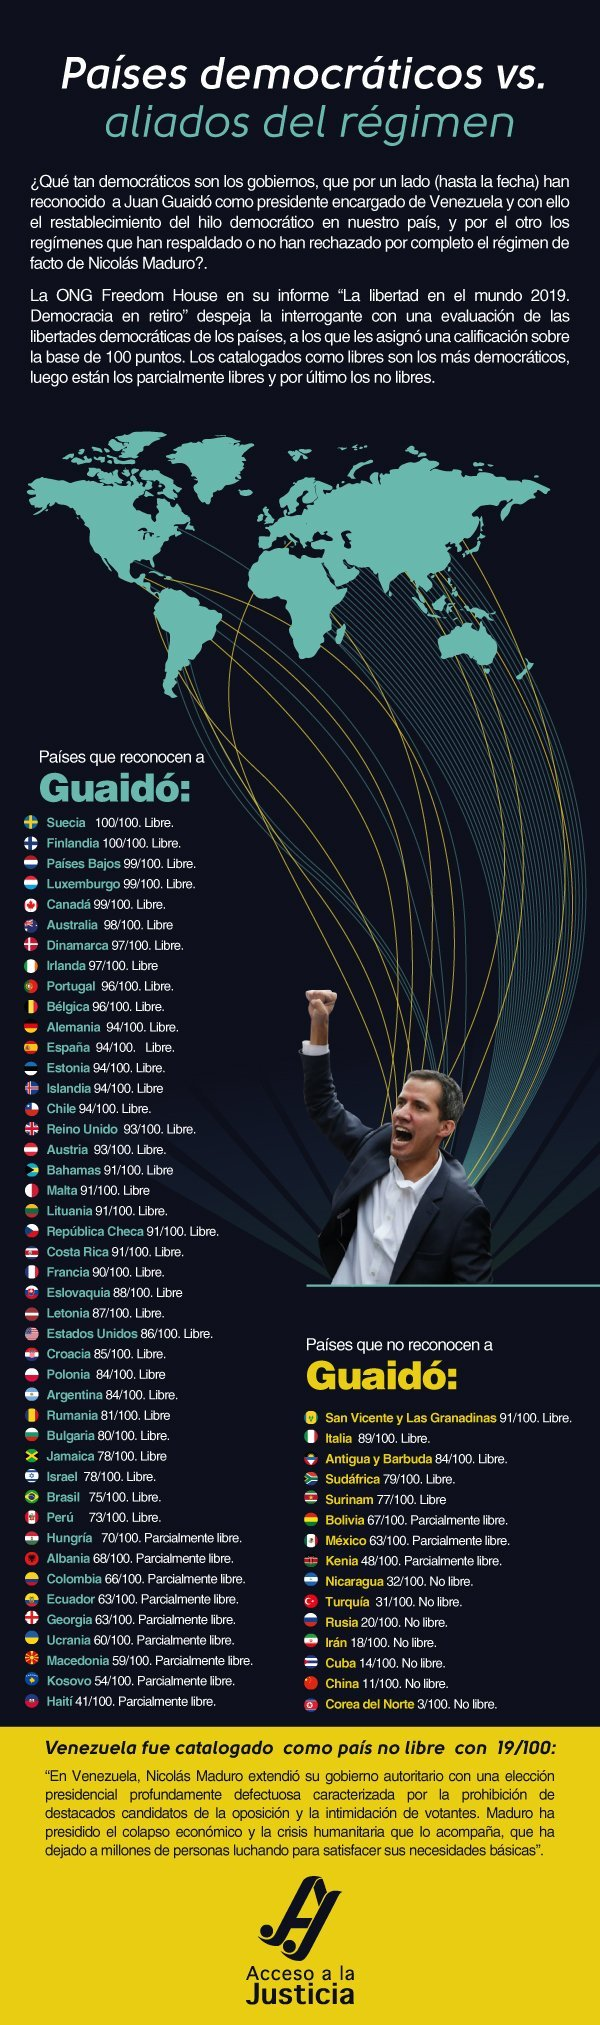 ¿Qué tan democráticos son los países que apoyan o rechazan a Juan Guaidó?